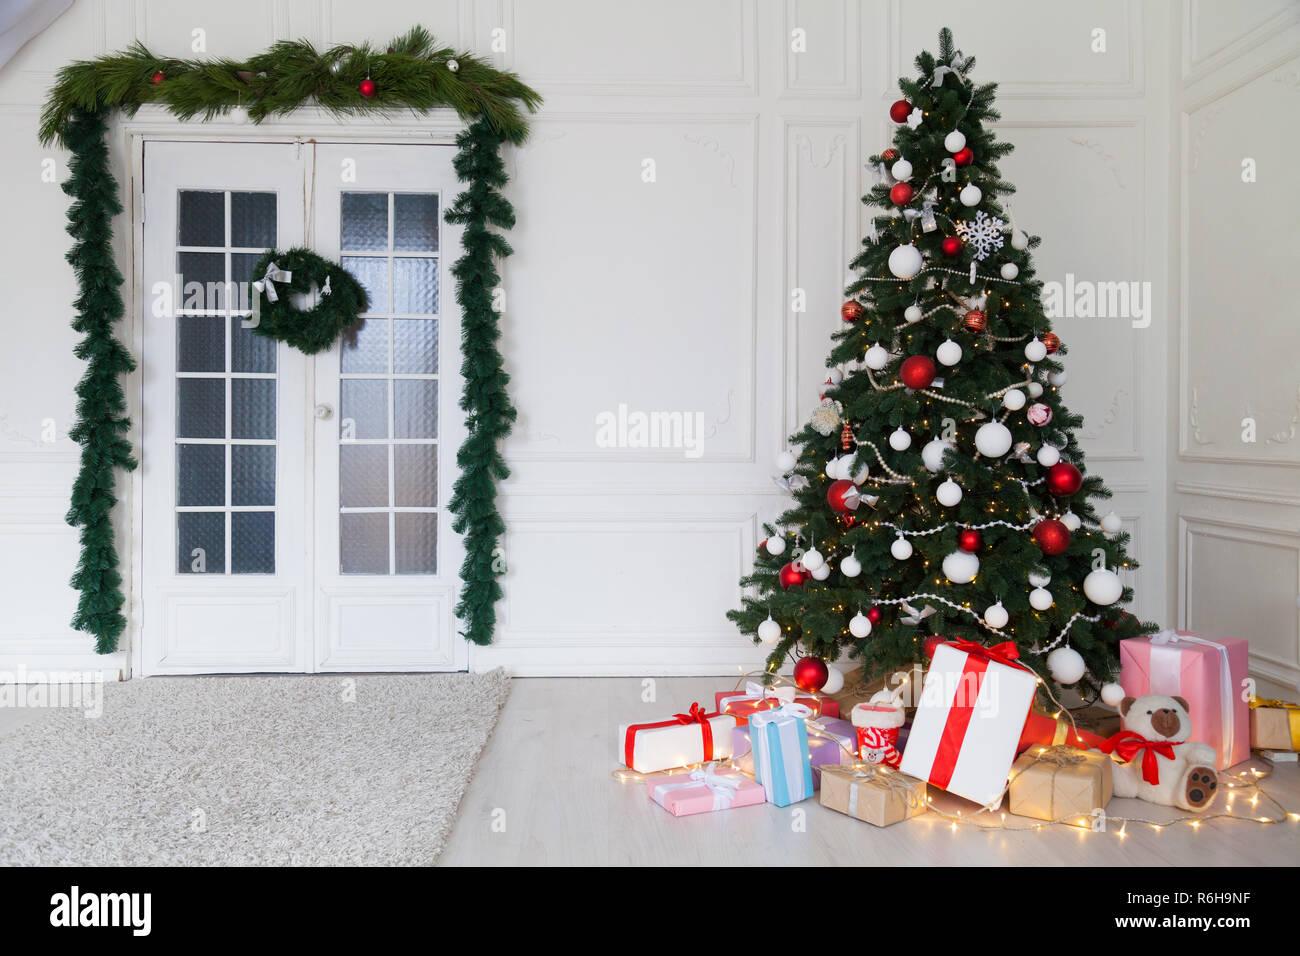 New Year Christmas Tree House Decoration Interior Winter Holiday